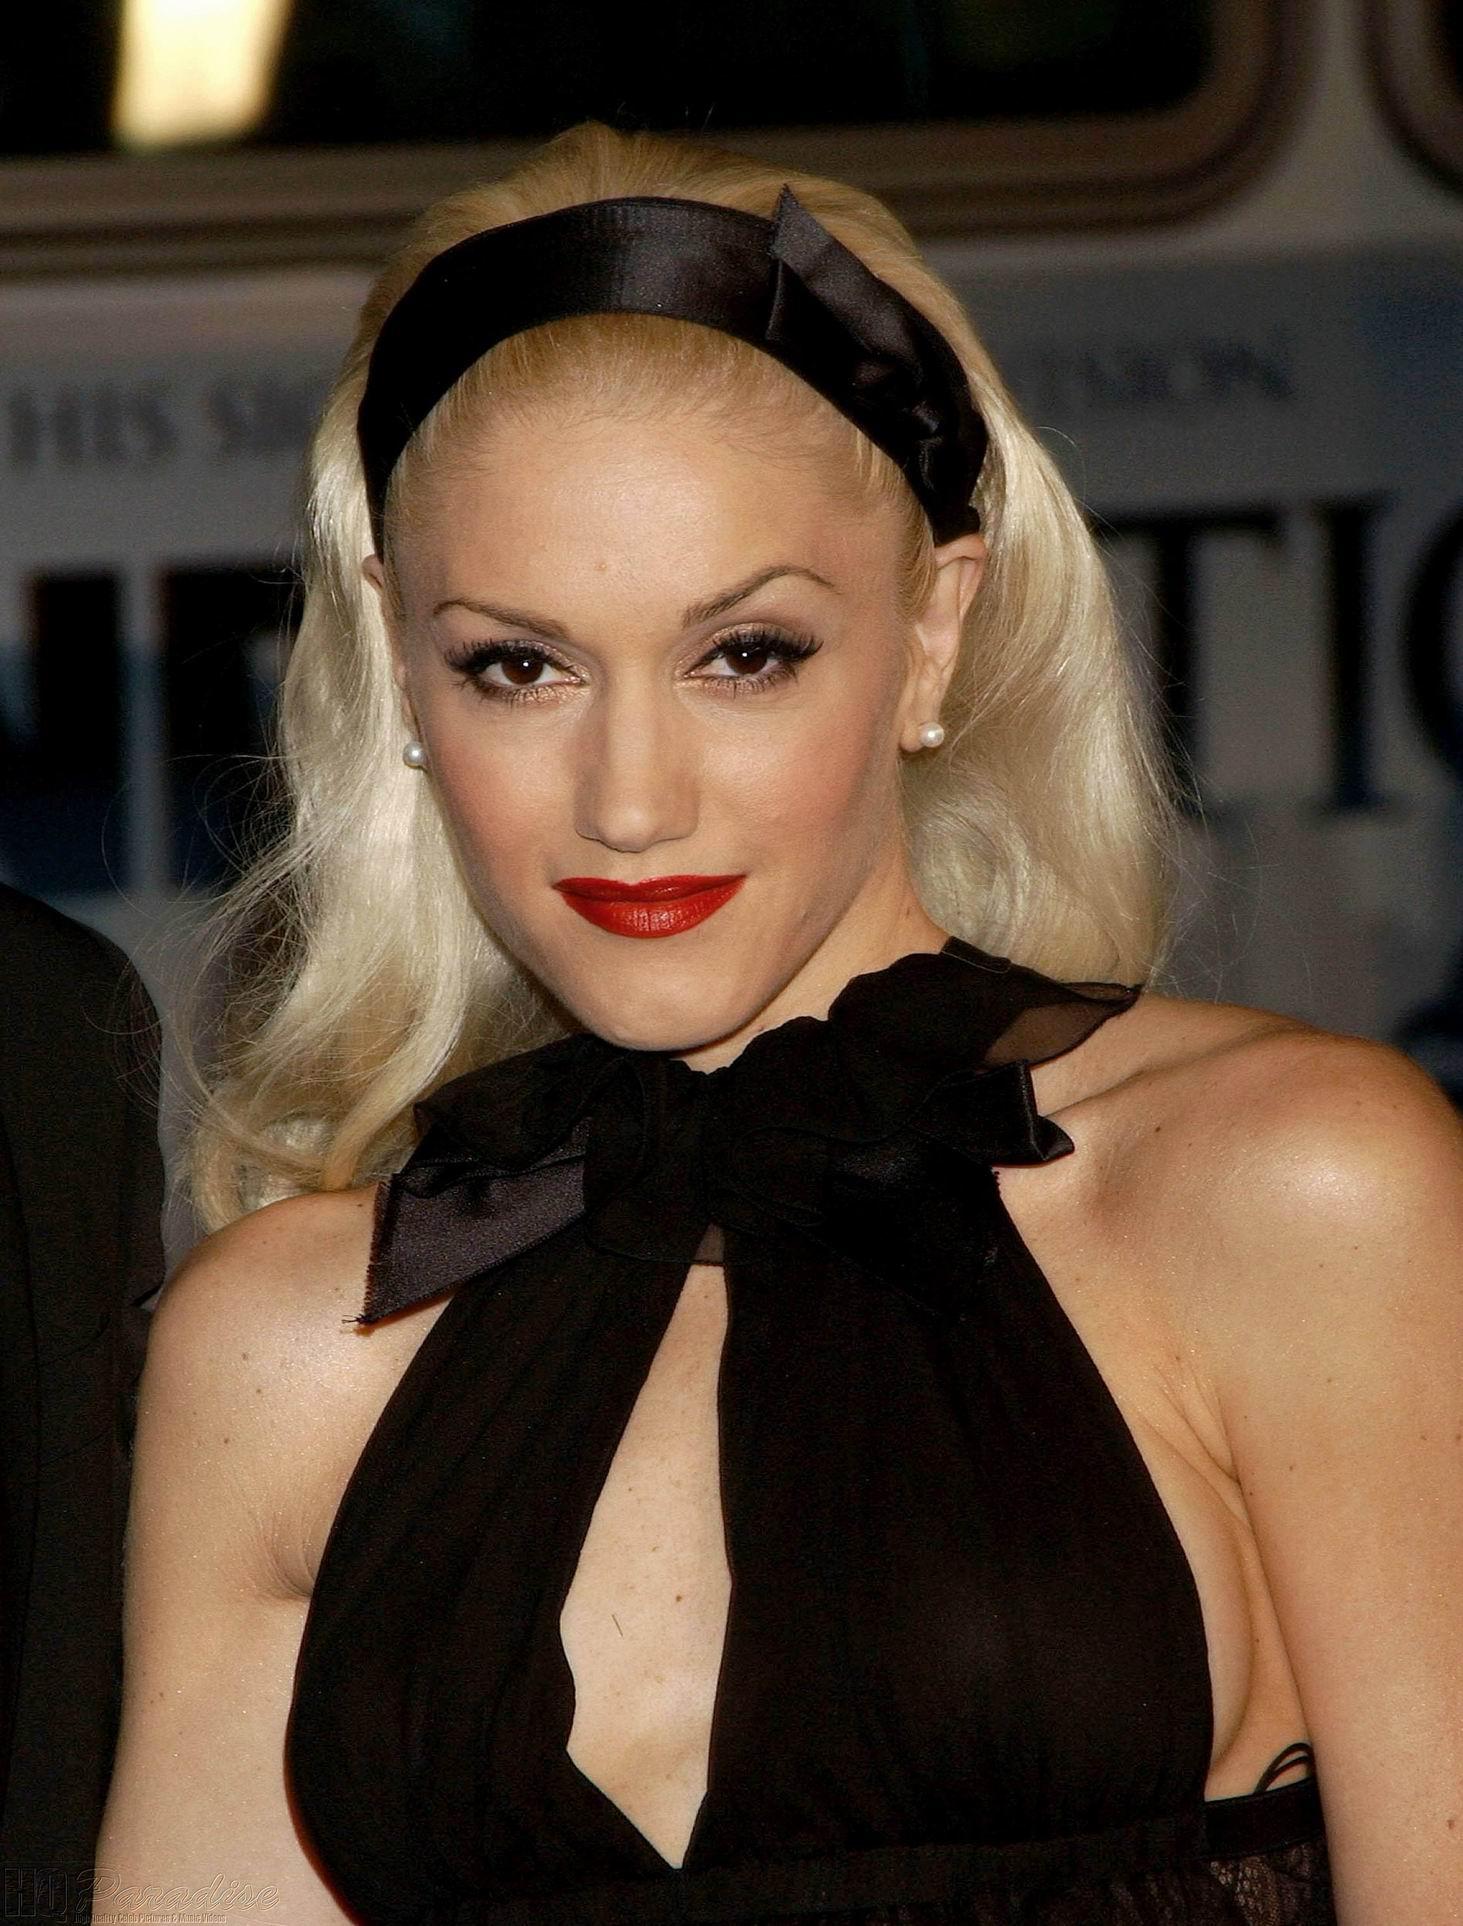 Gwen stefani's nude makeup